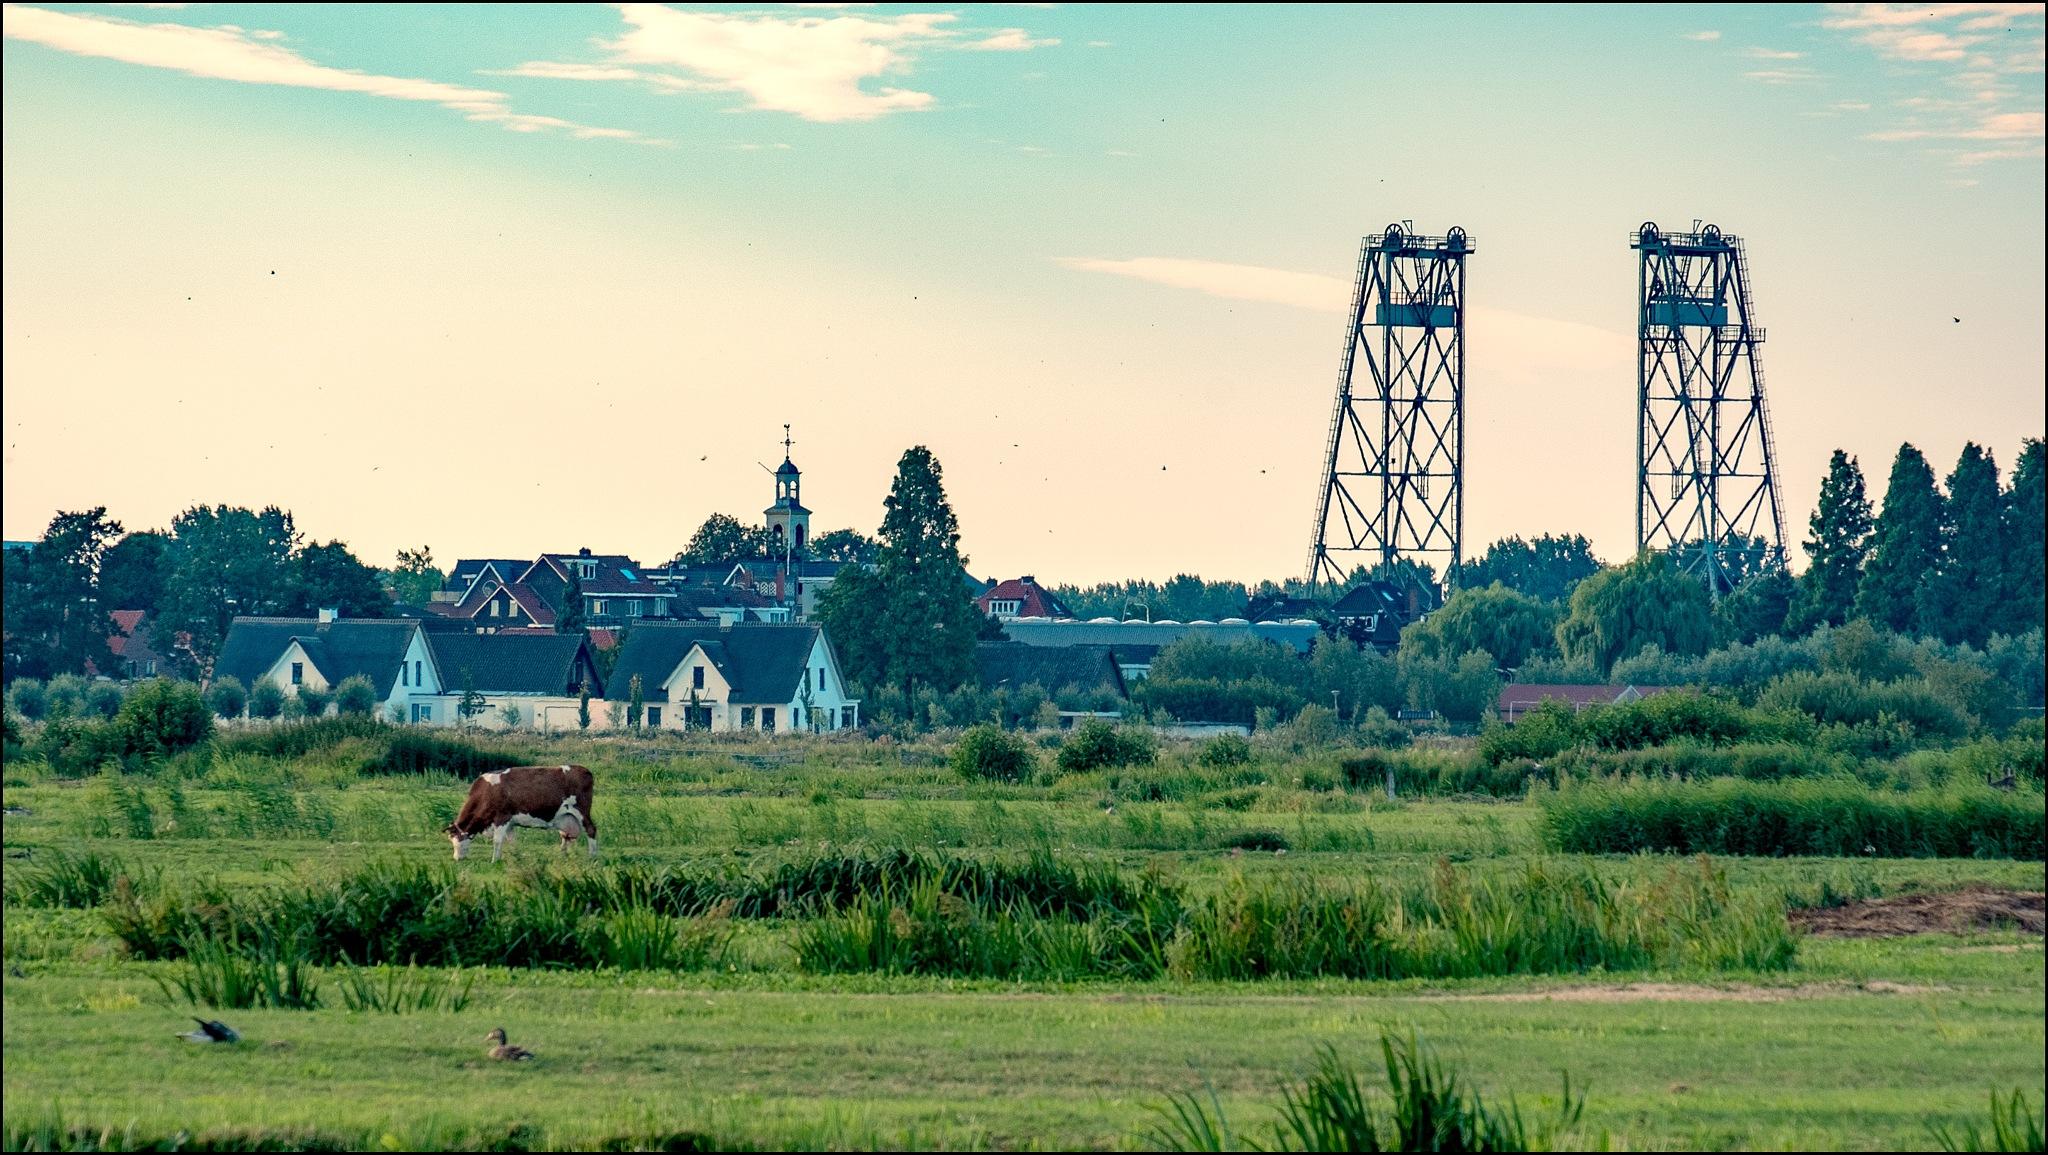 Waddinxveen by Bram de Mooij